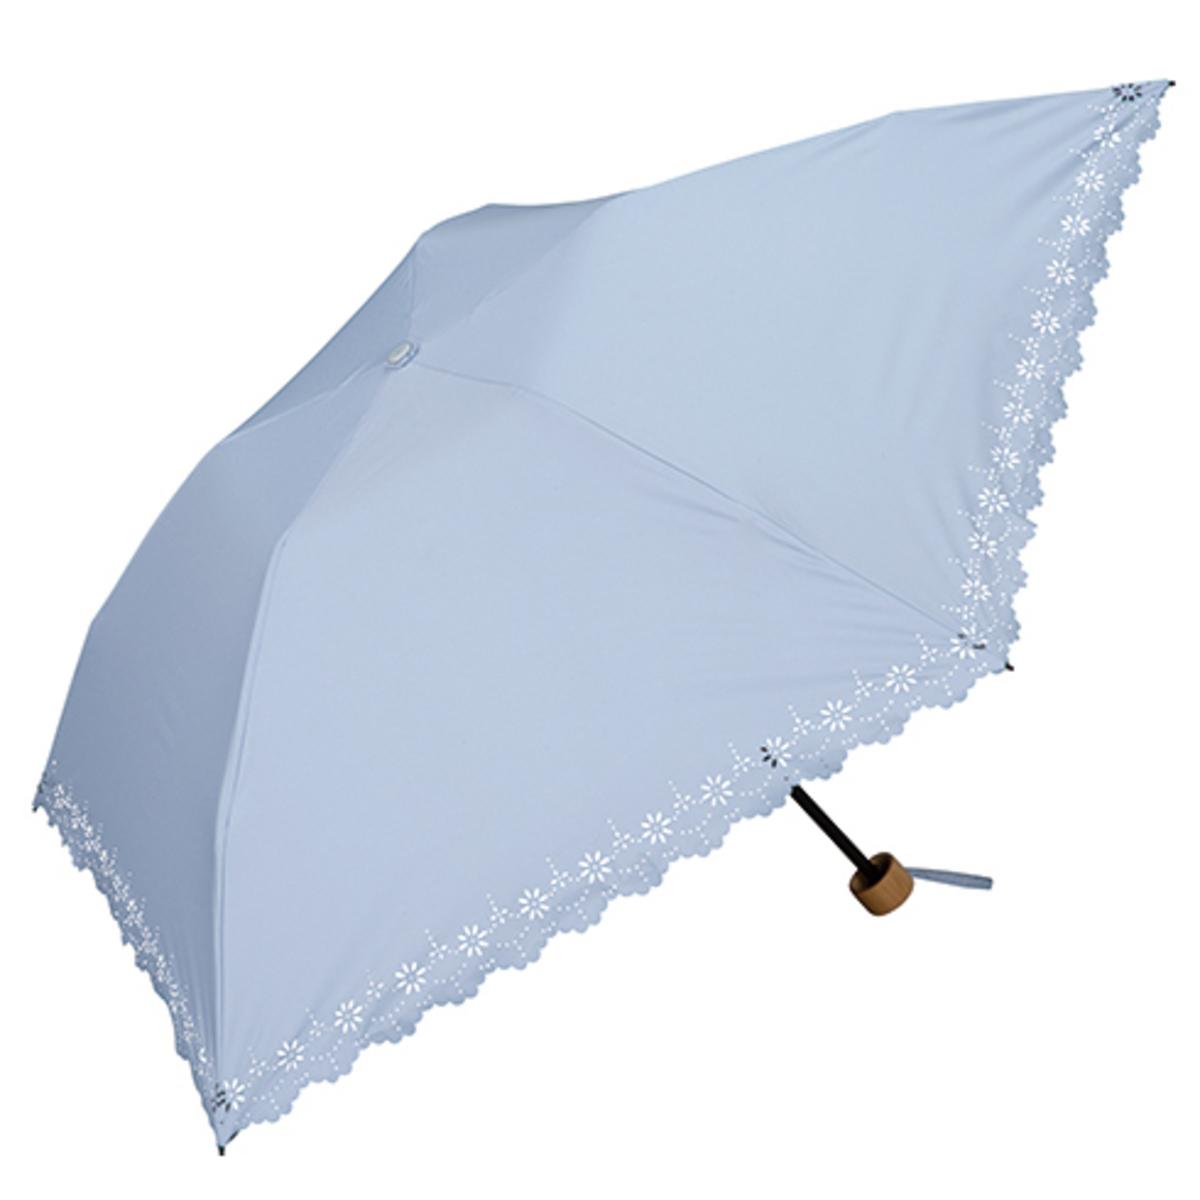 UV Protection Light Weight Folding Umbrella - Flower Blue 801-508 (SX25)